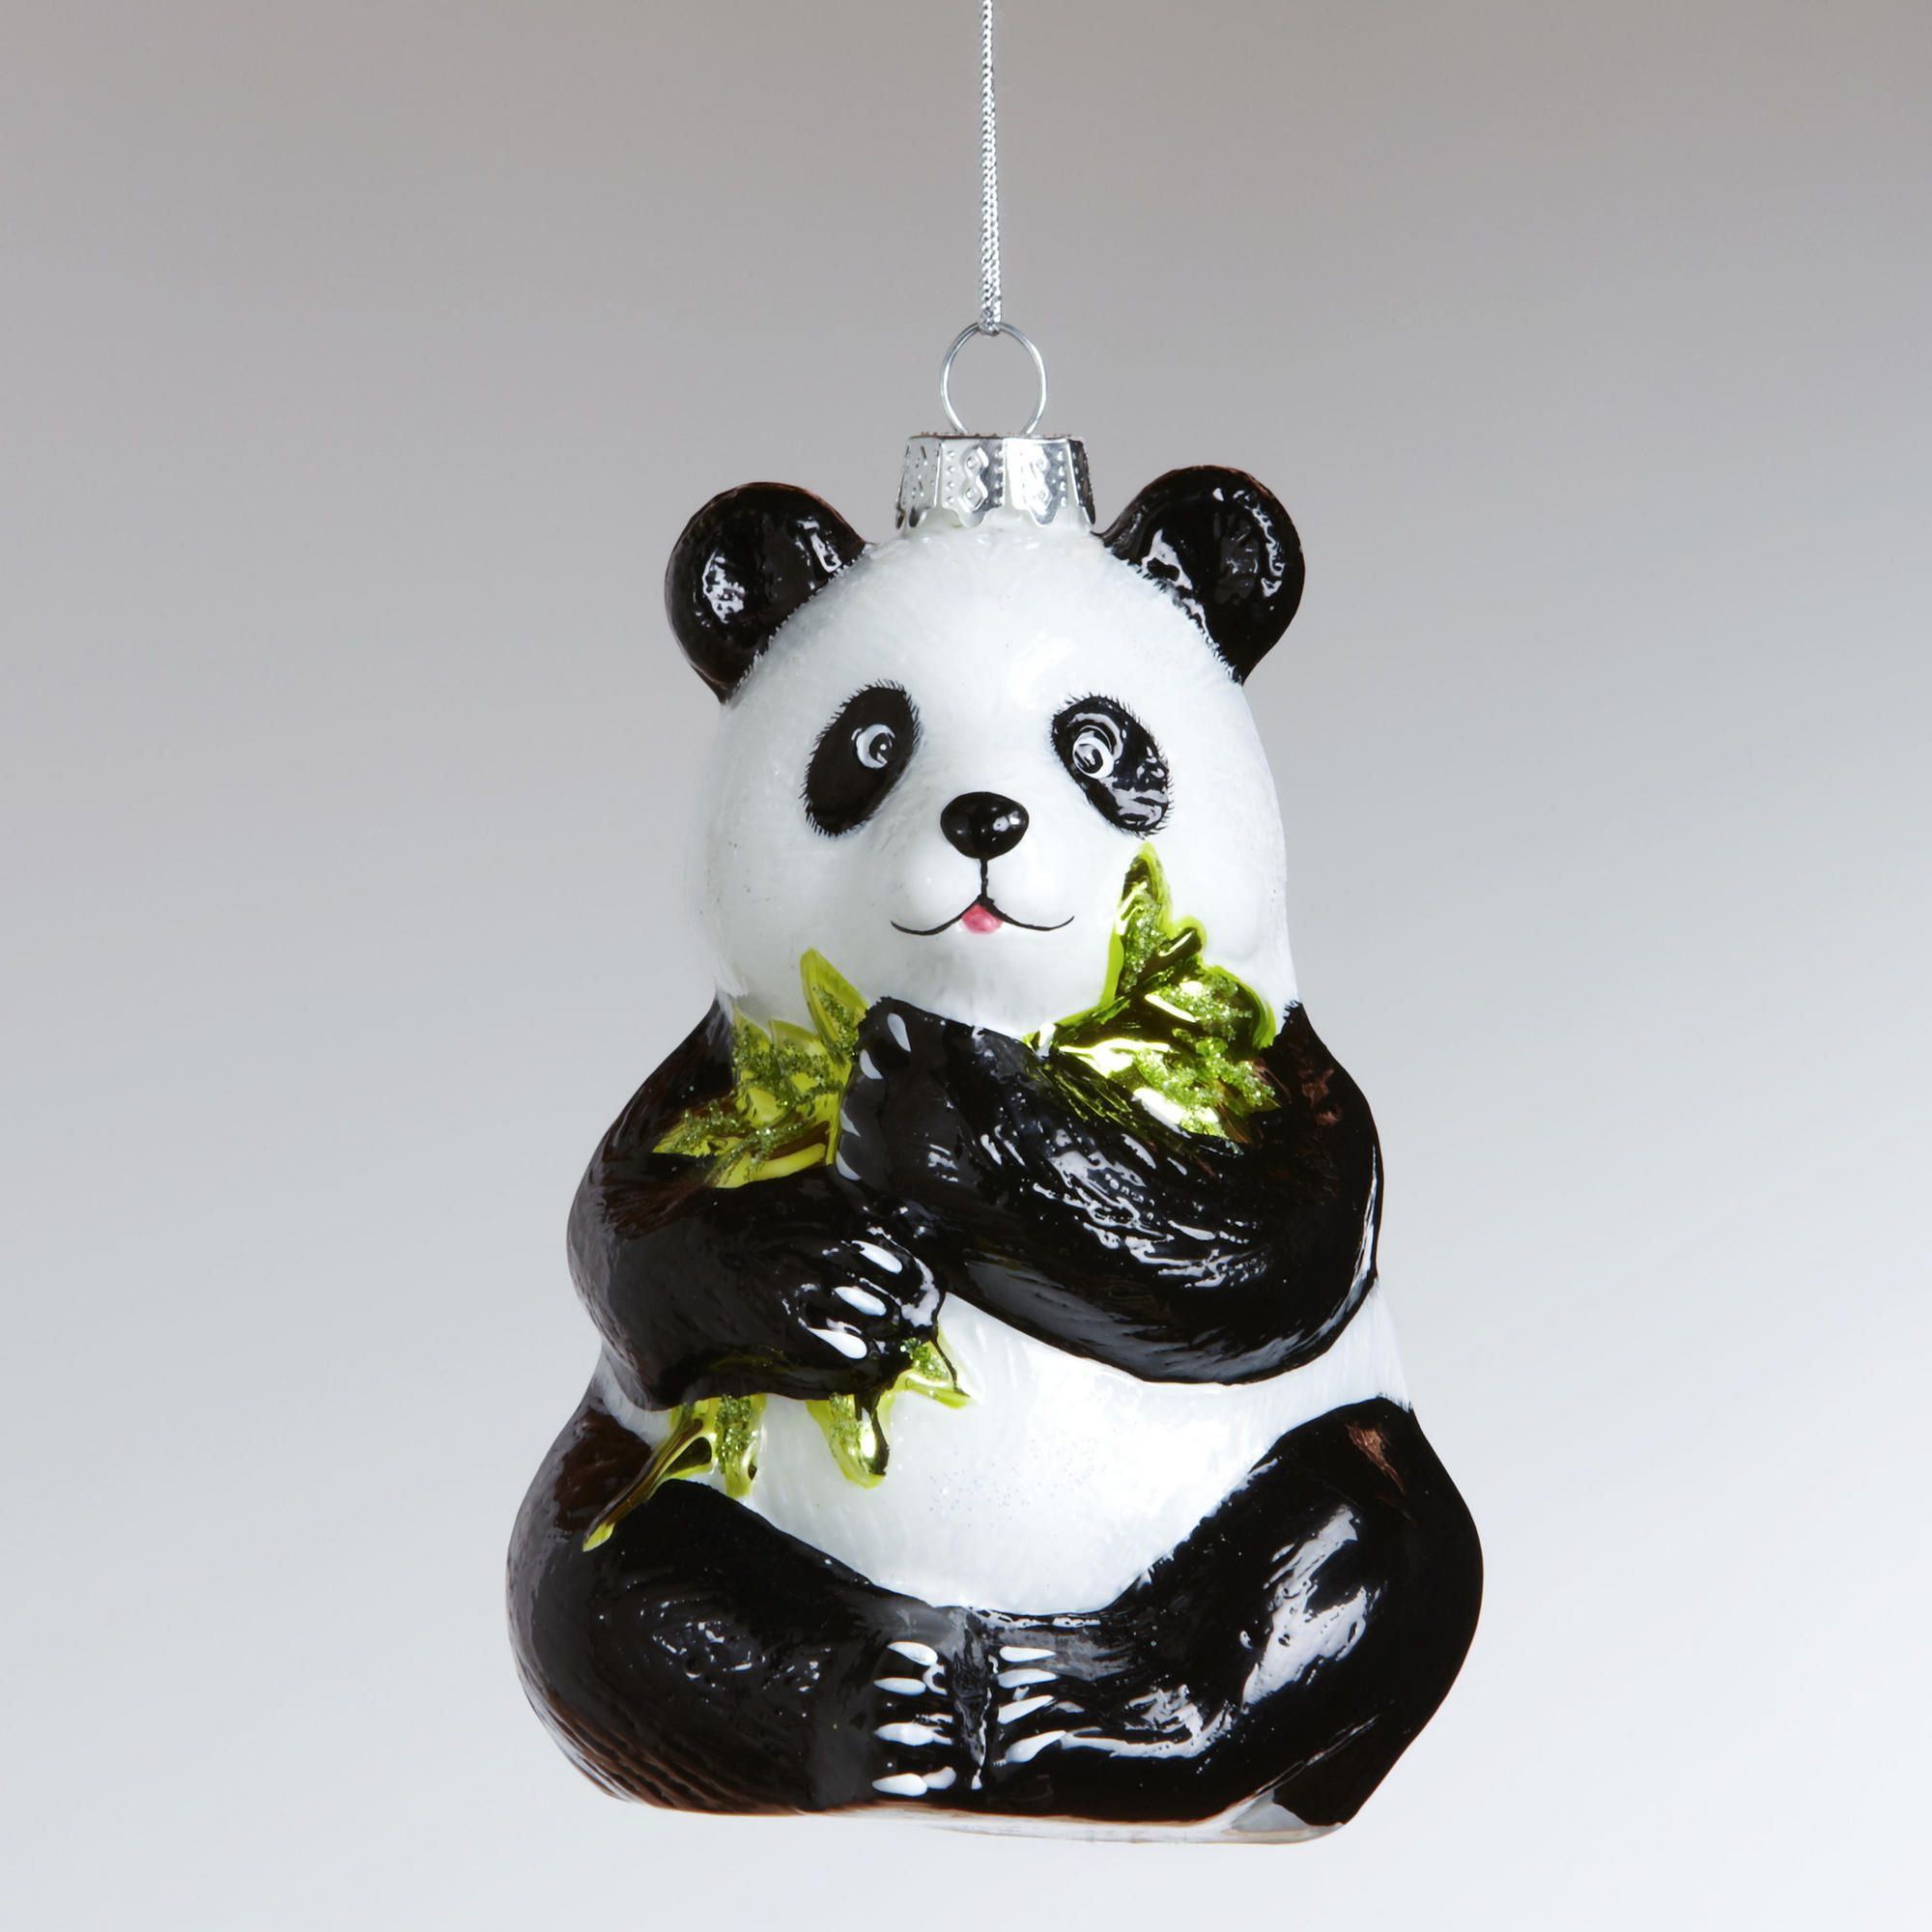 Glass Sitting Panda Ornament